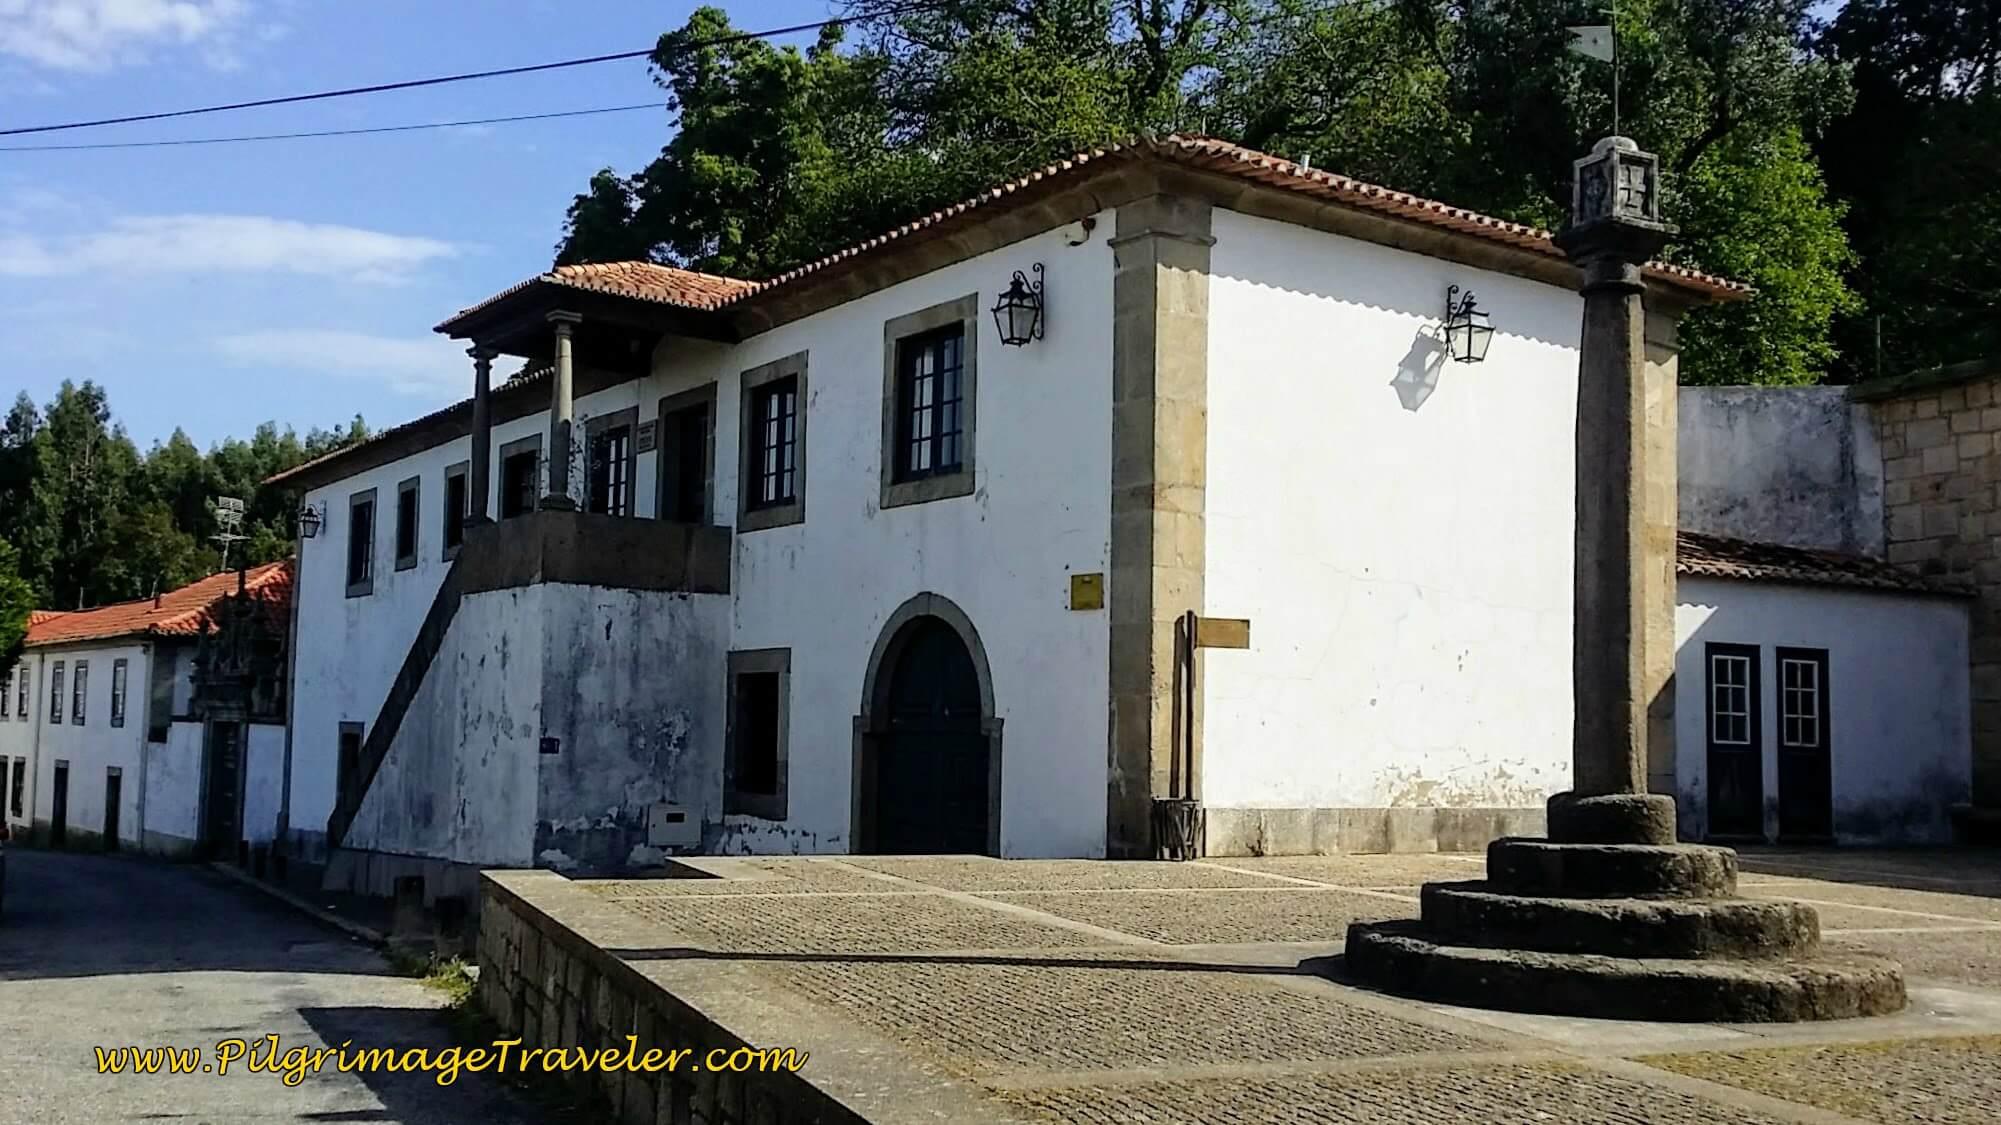 Historic Square of Bemposta on the Portuguese Way